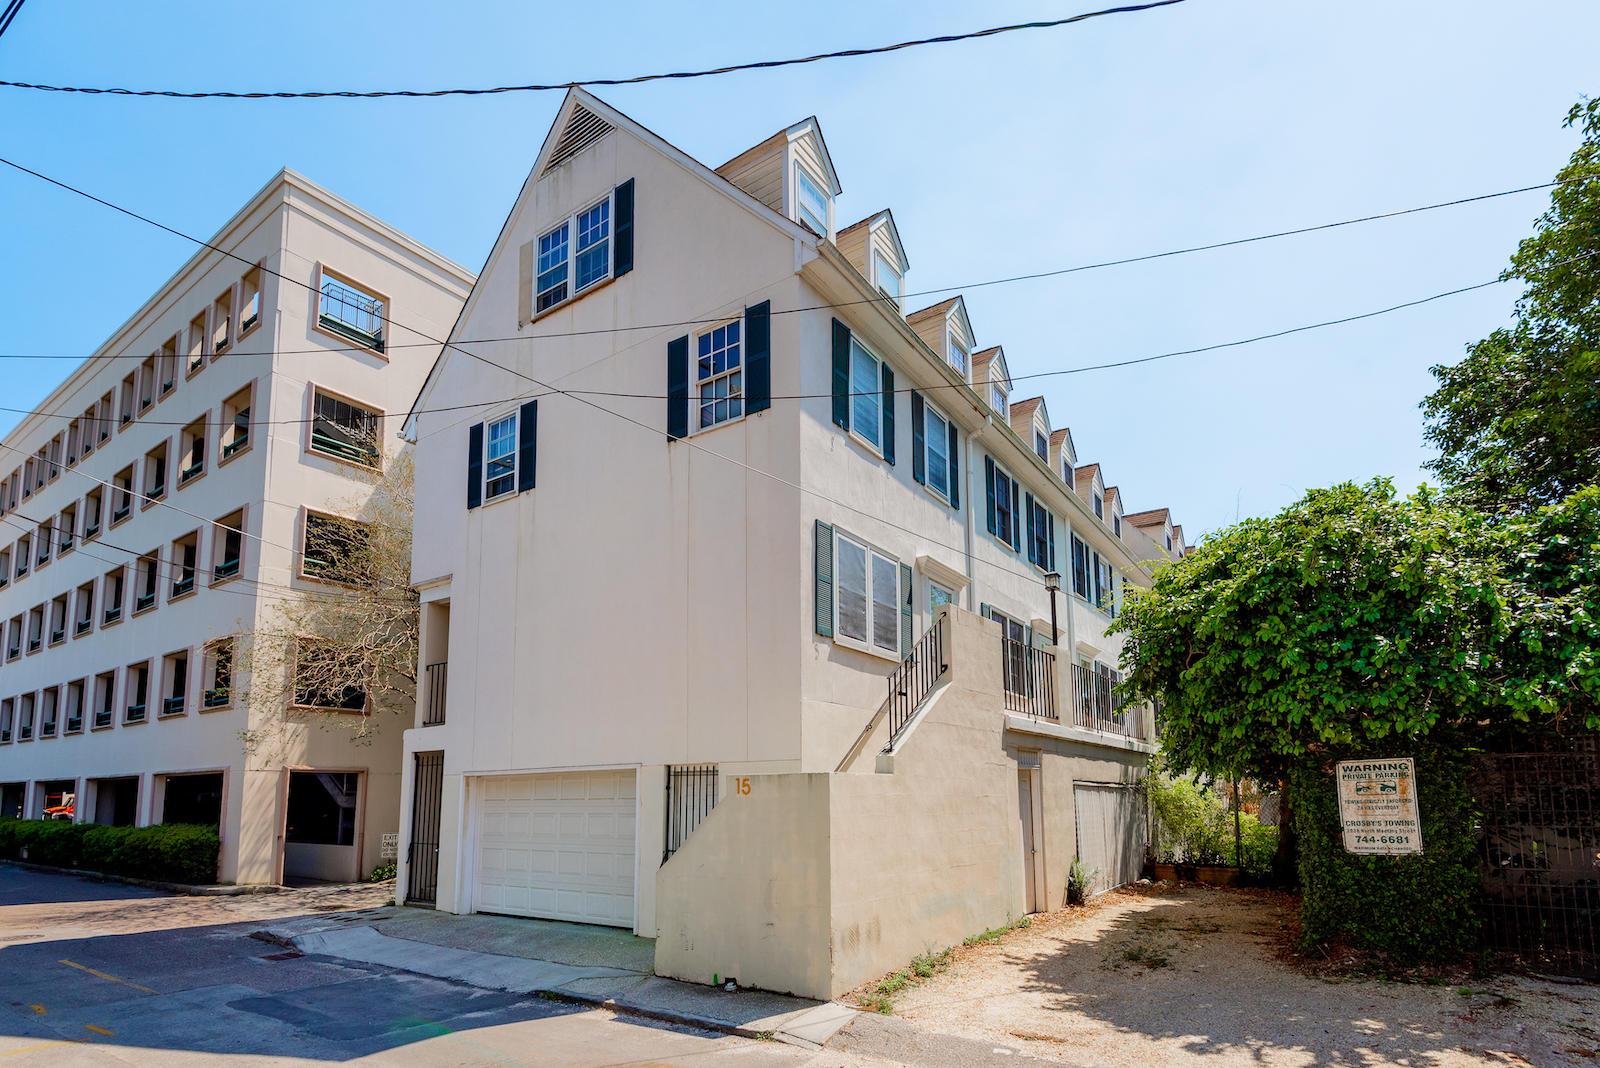 Harleston Village Homes For Sale - 15 Horlbeck, Charleston, SC - 18